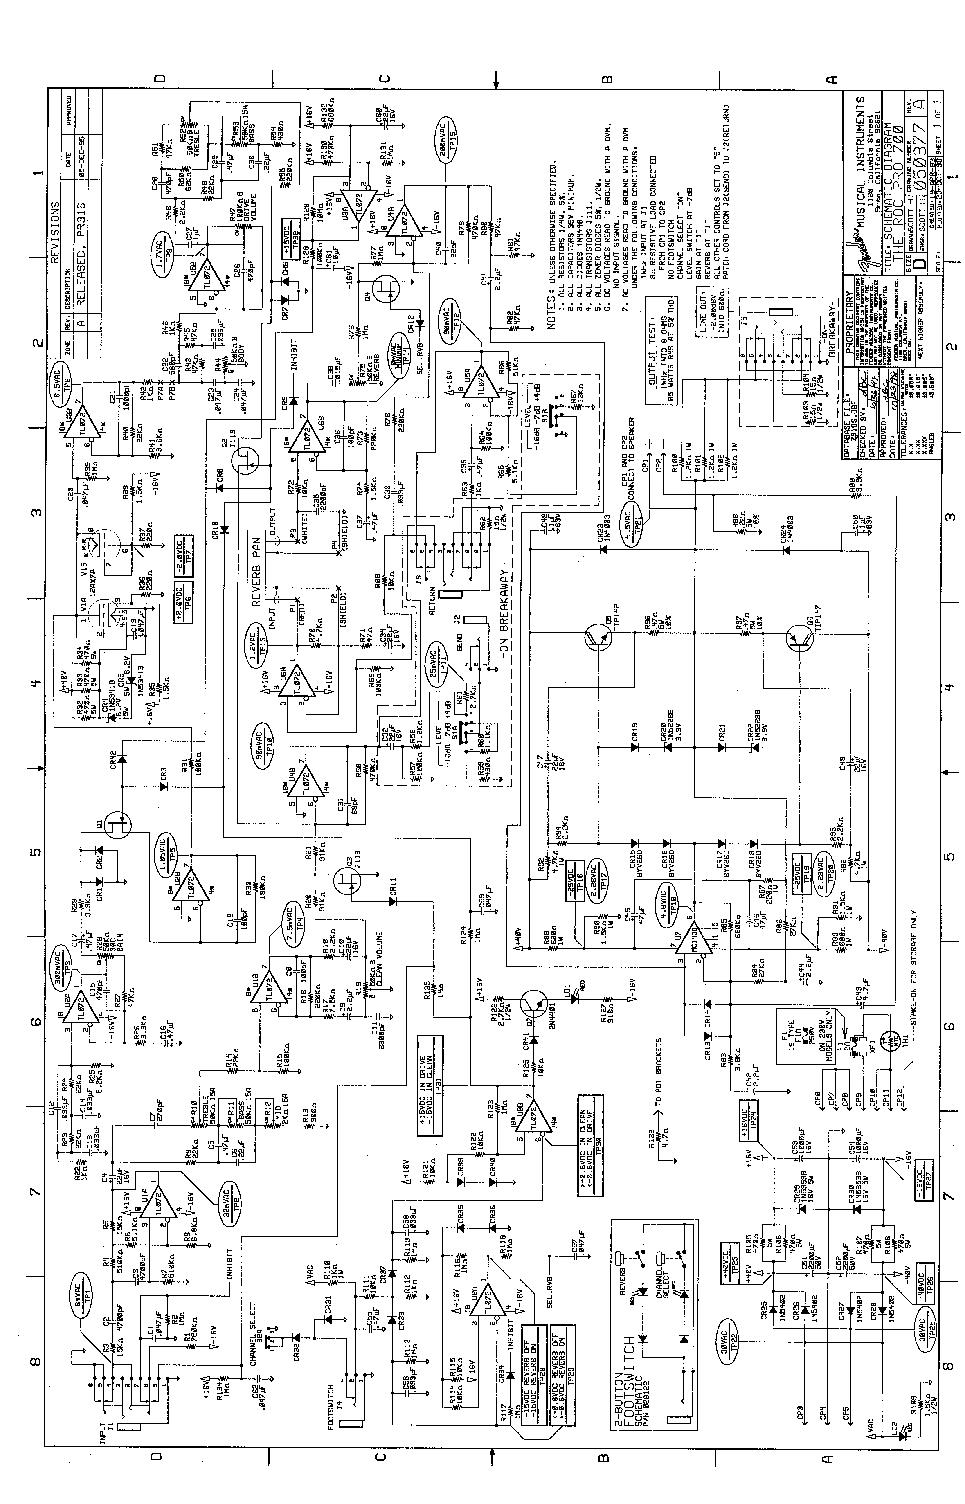 fender super twin reverb schematic pdf fender tremolux 5e9 schematic